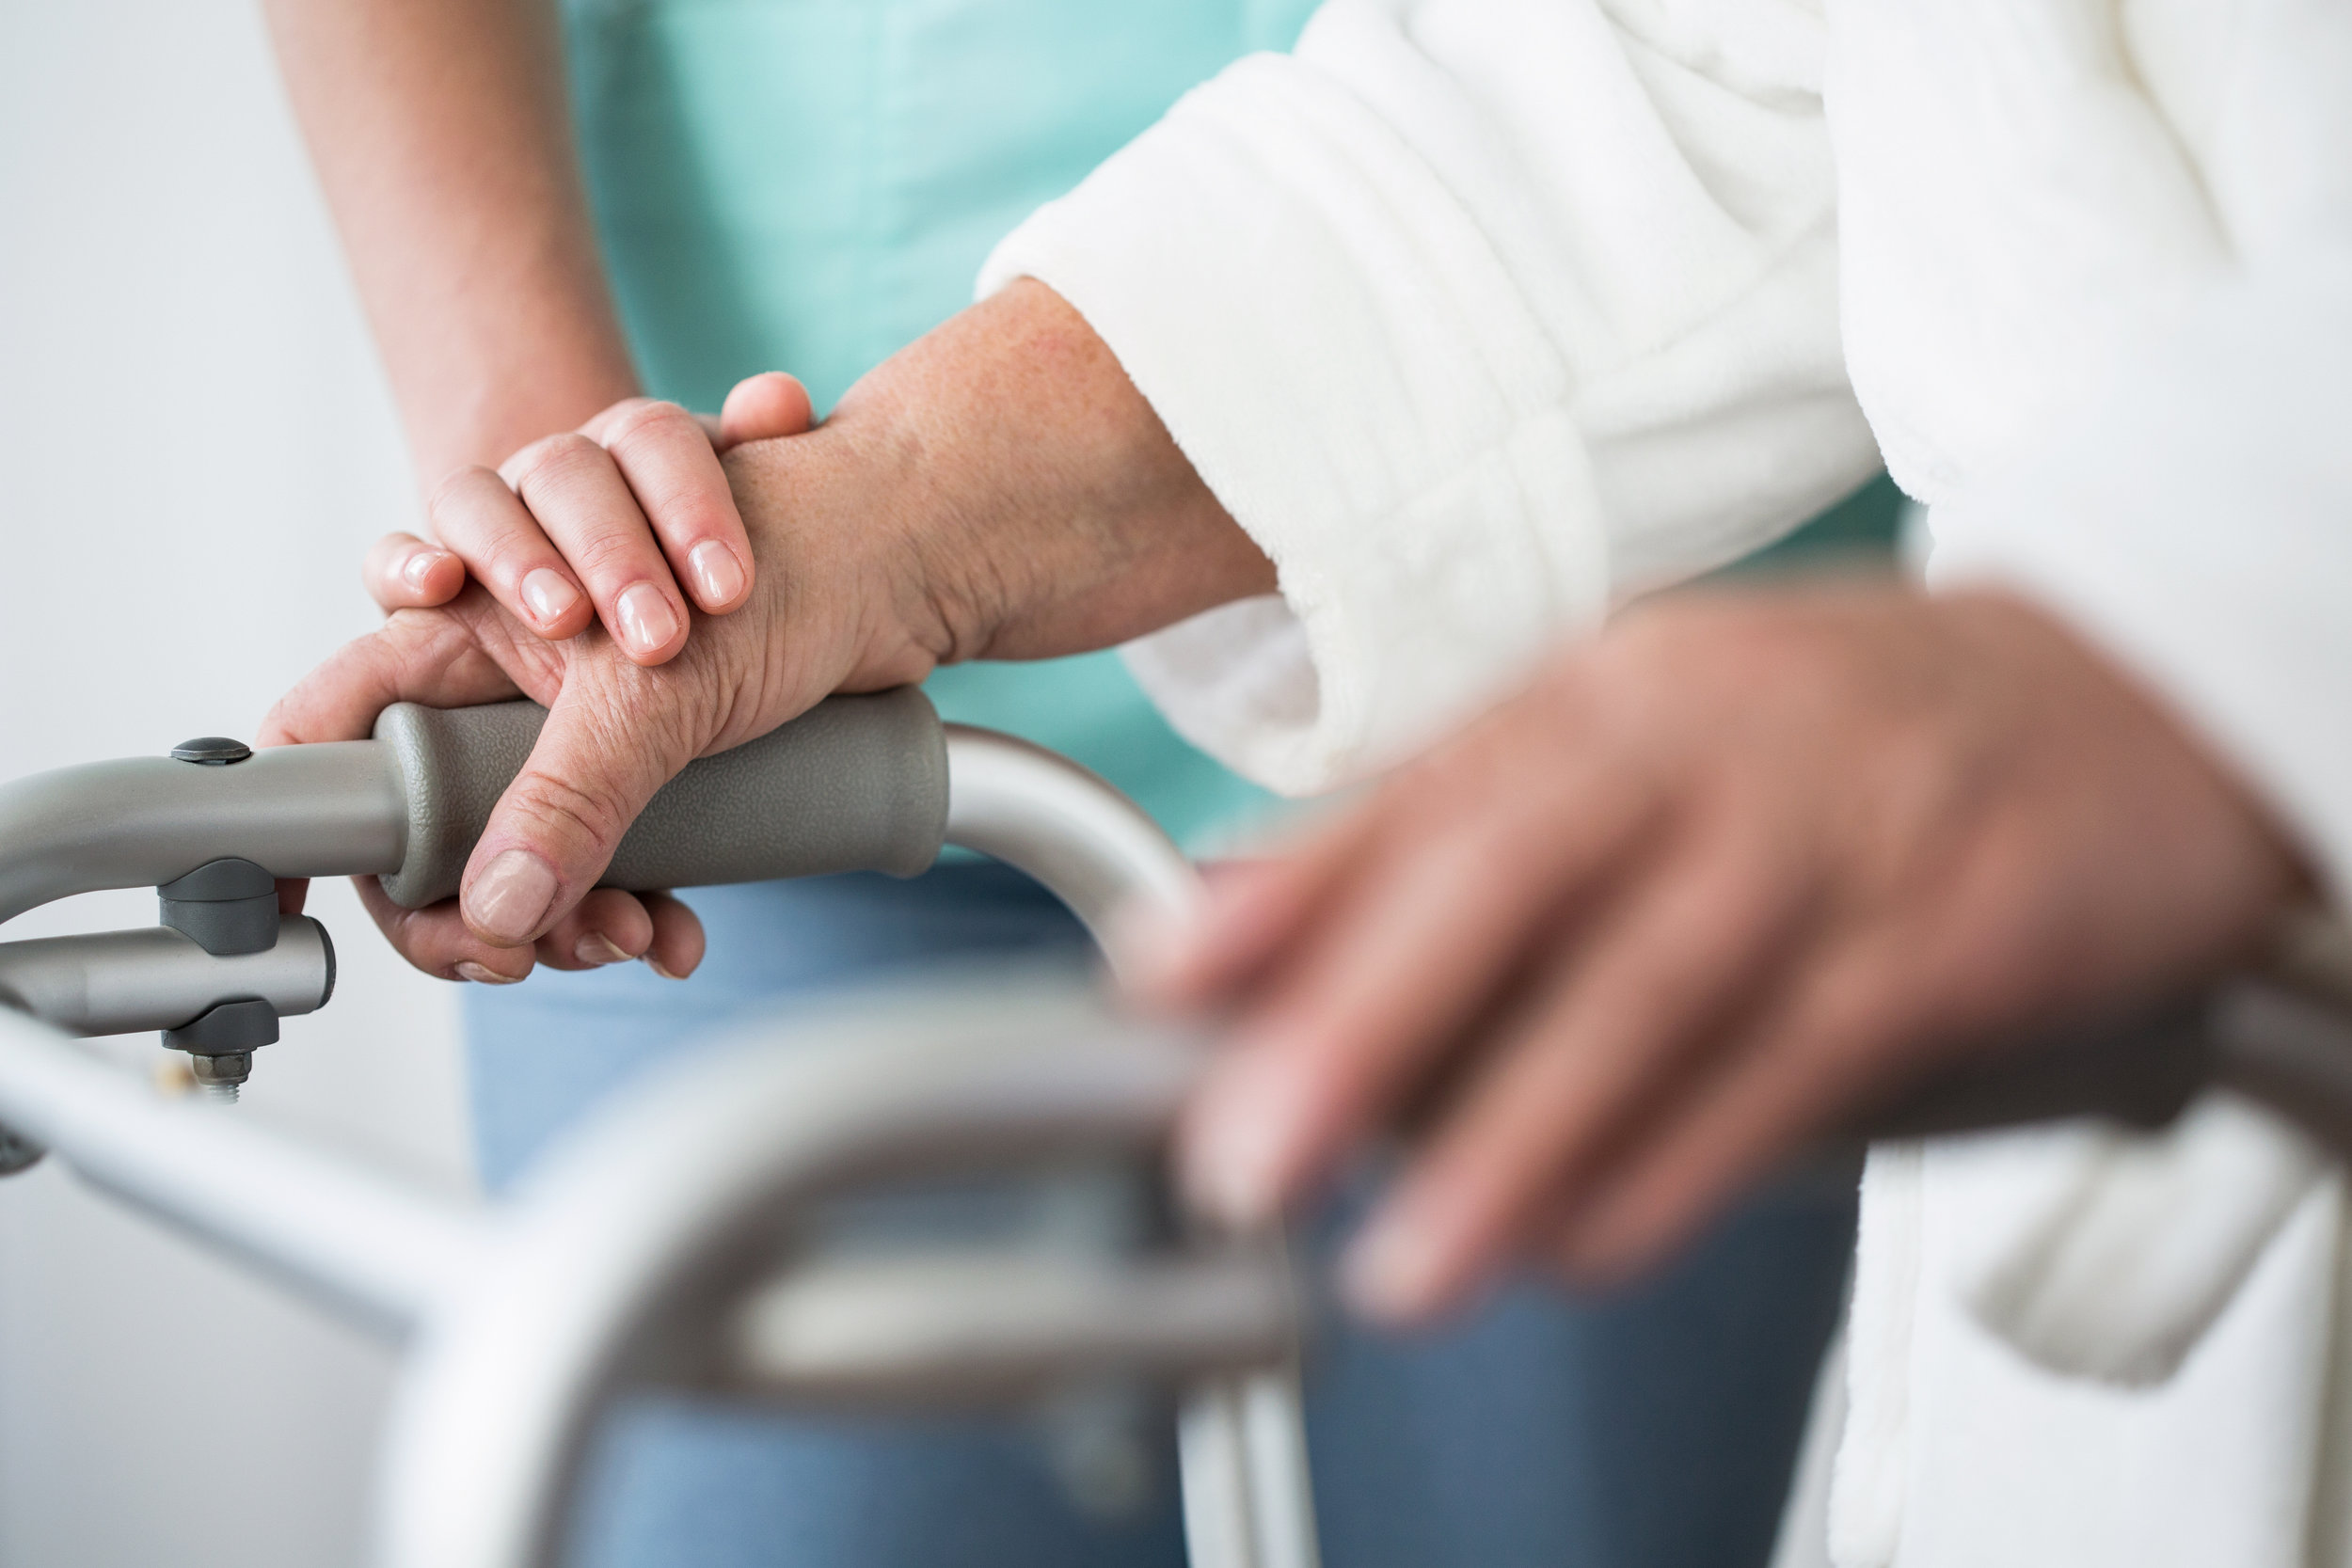 respite care oxford home healthcare in tulsa oklahoma respite care providing temporary care after surgery.jpg